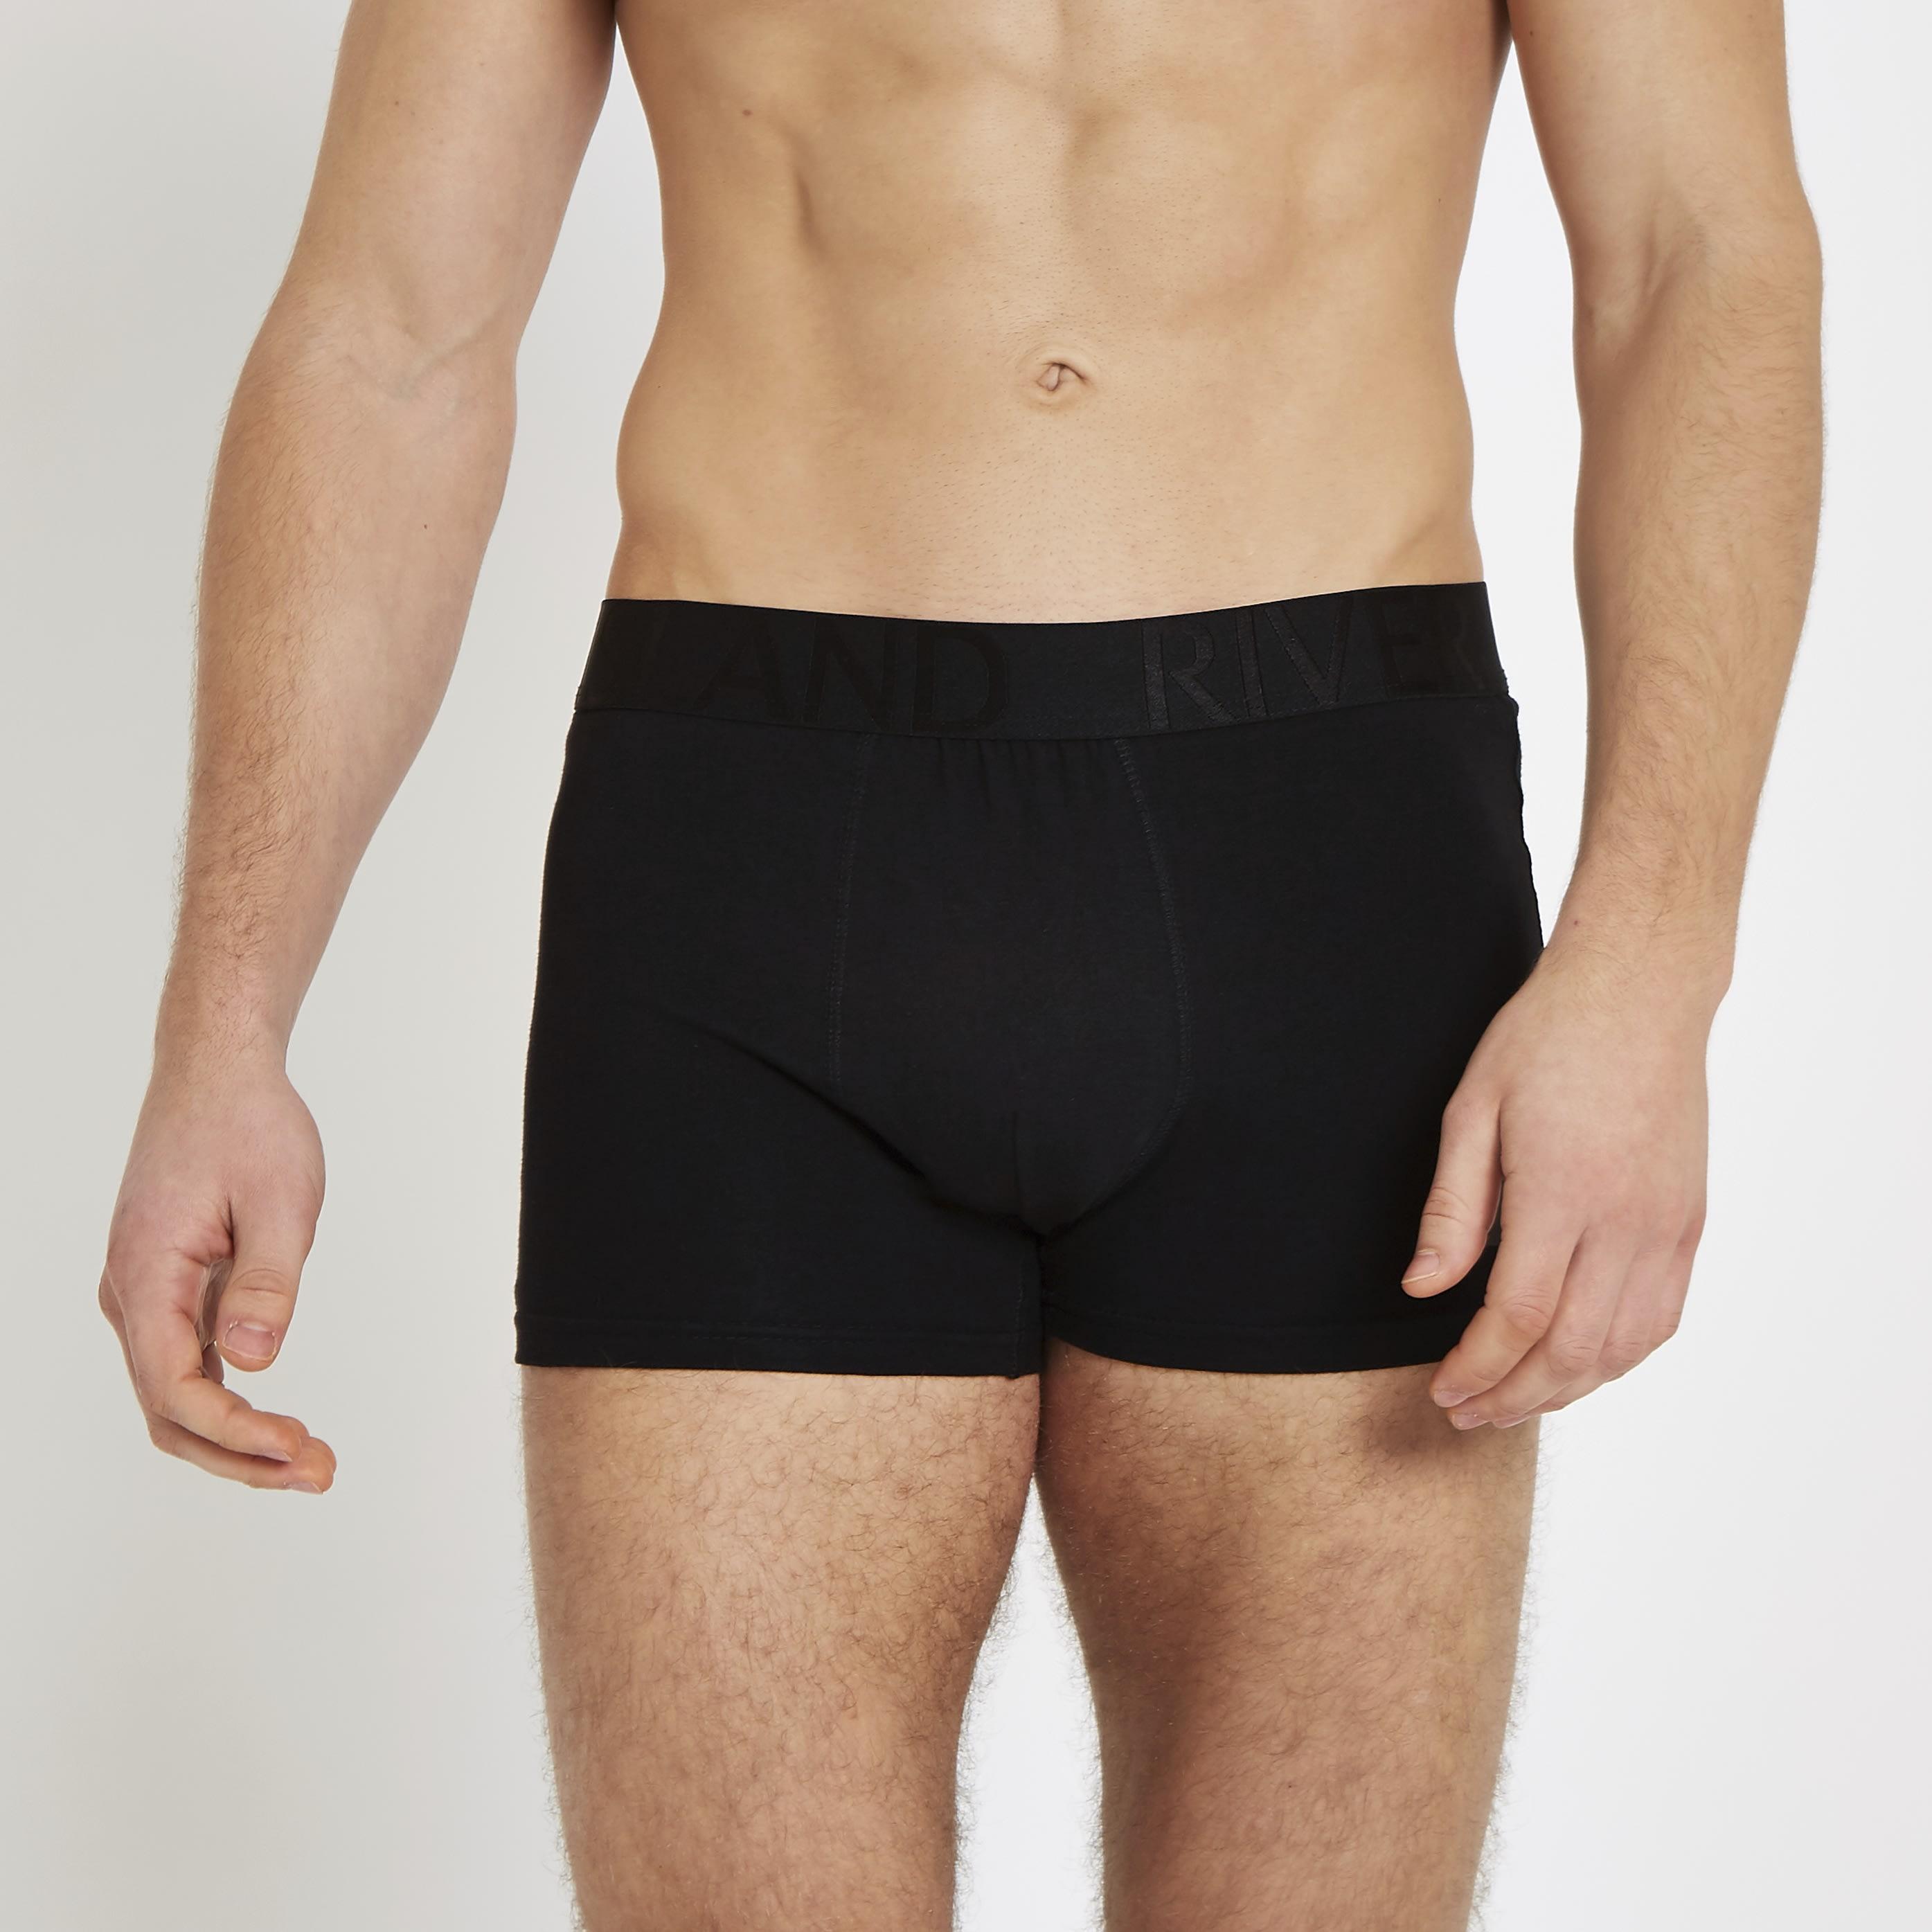 River Island Mens Black RI waistband trunks 5 pack (S)